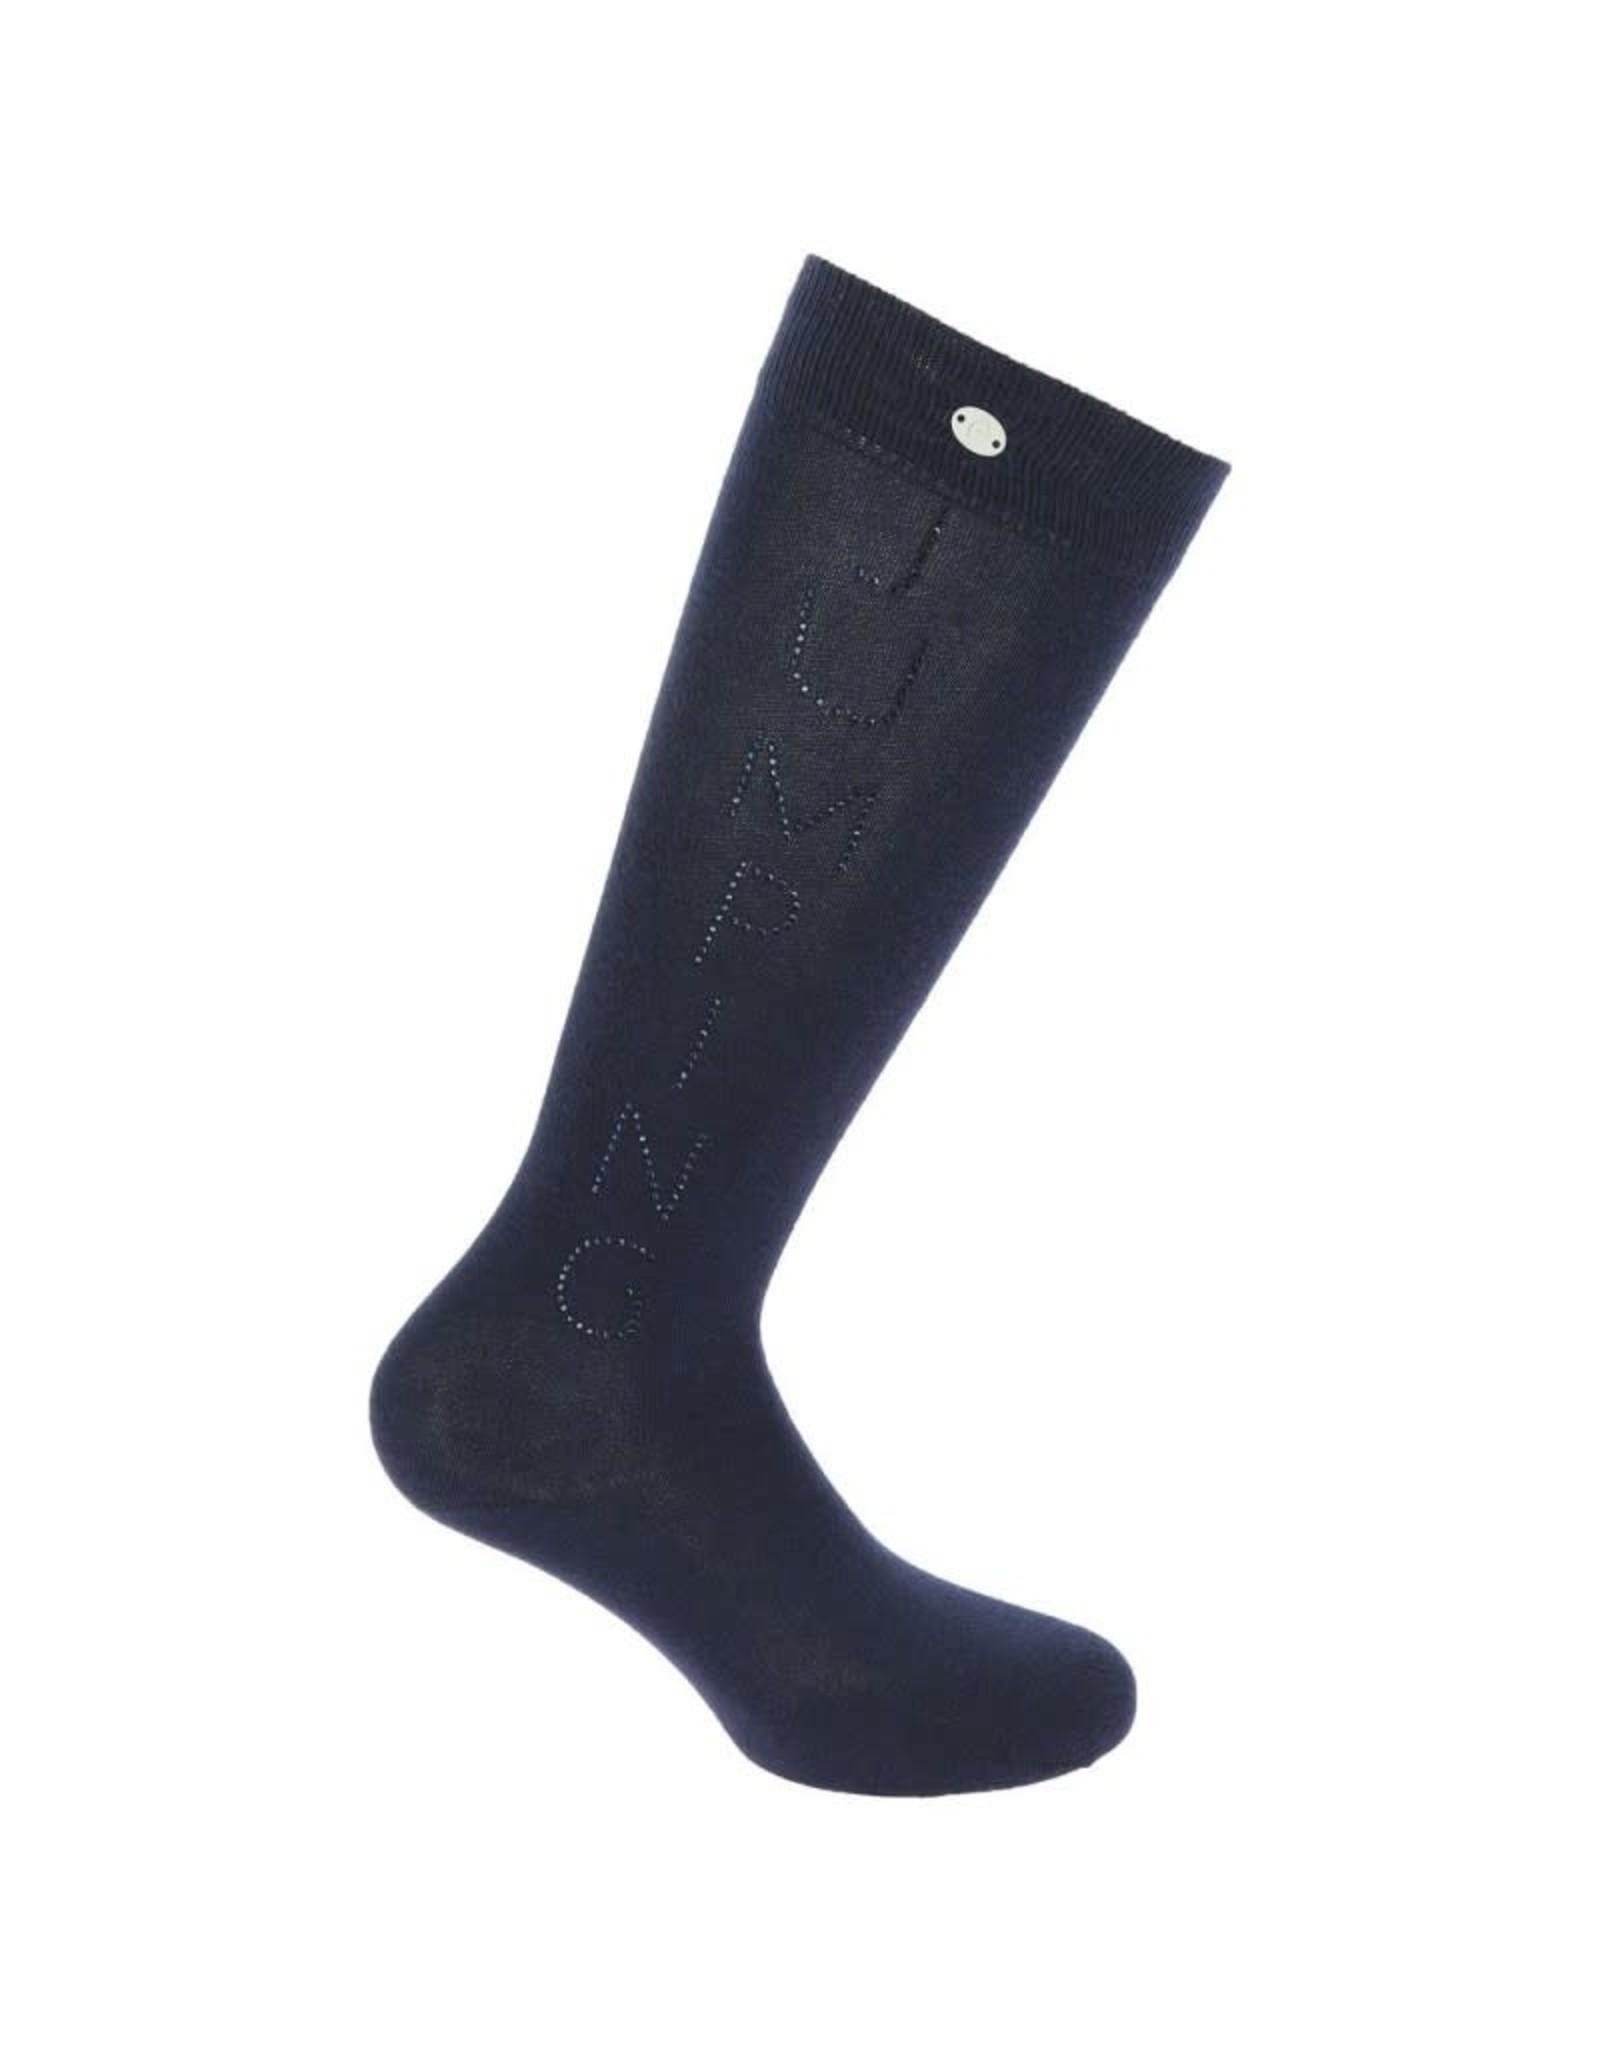 Equithème Equitheme sokken Jumping